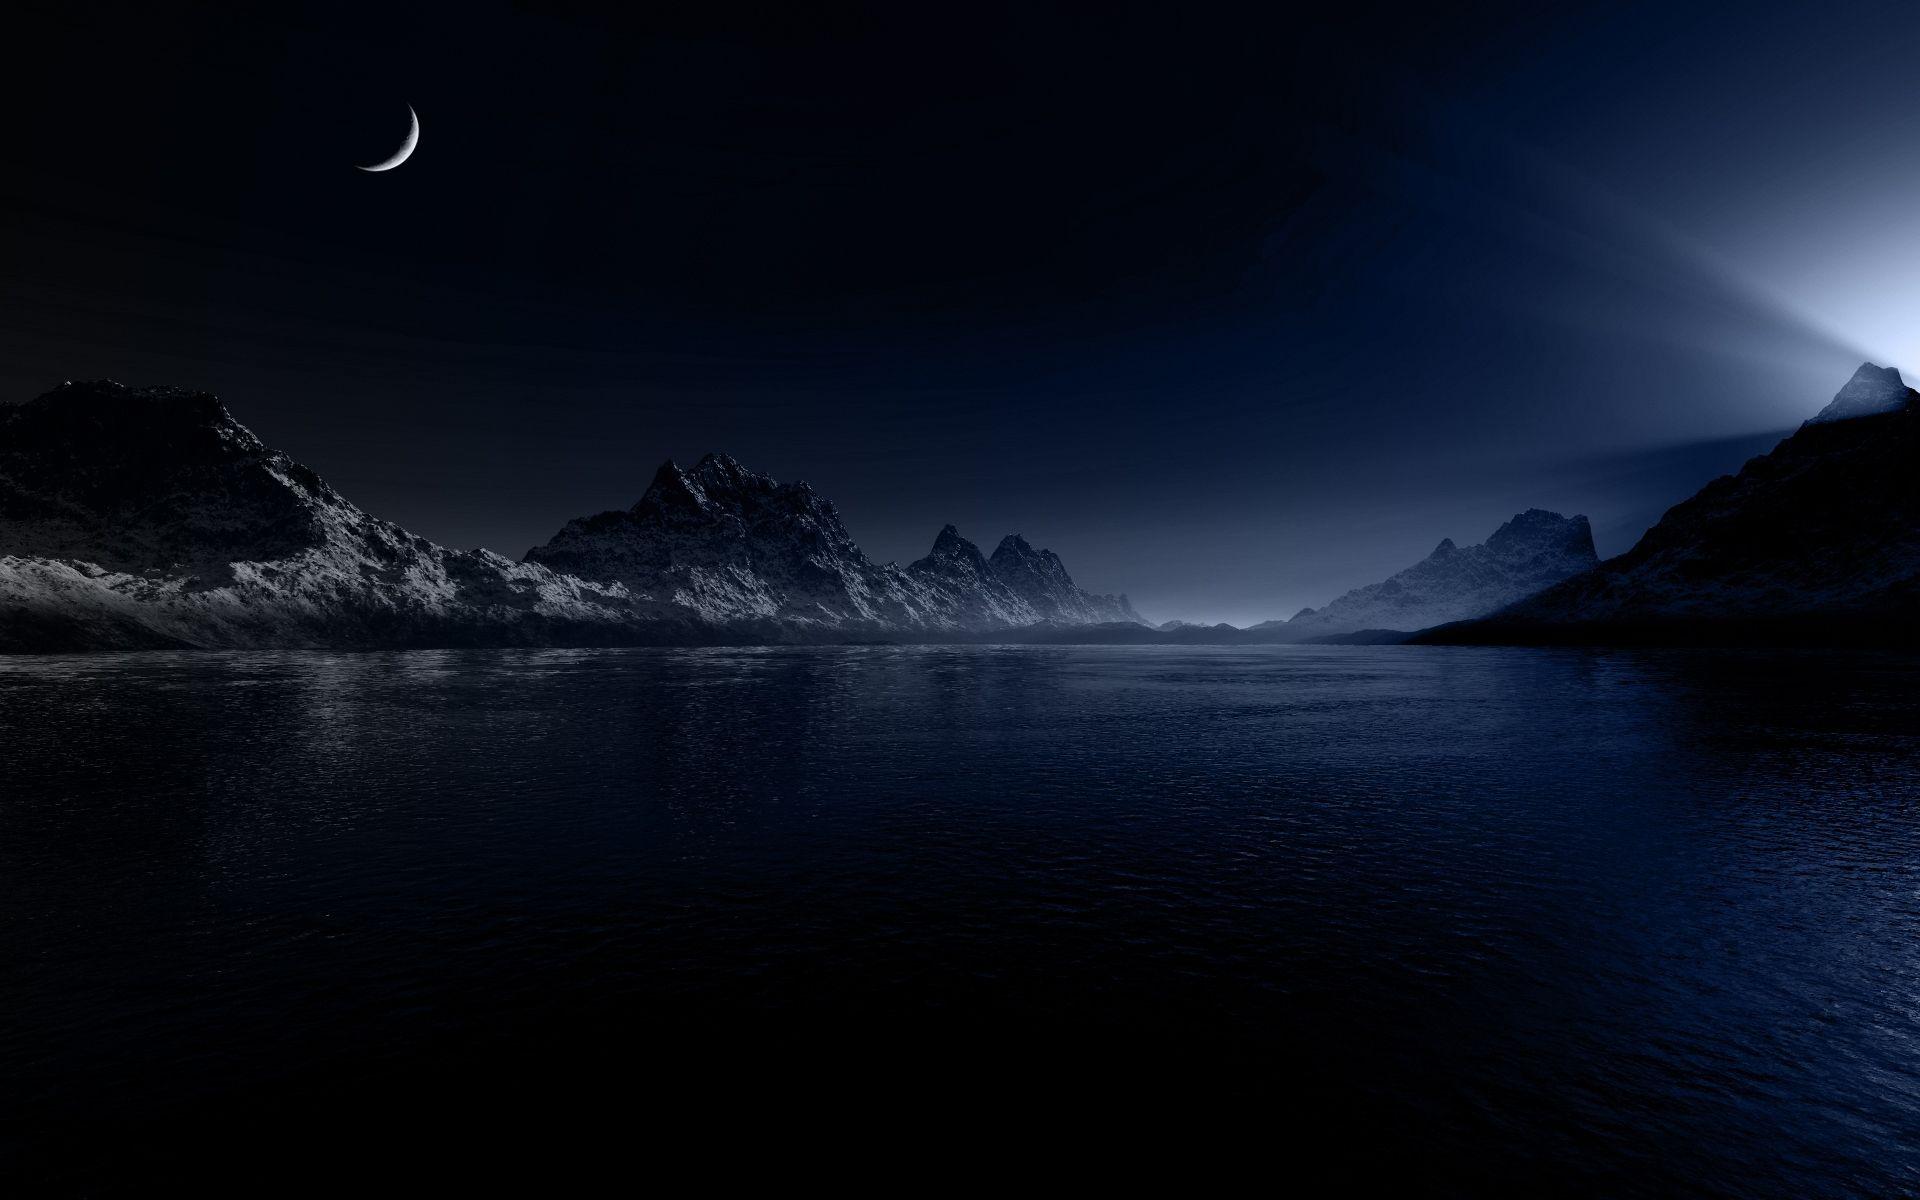 Sea Night Wallpaper Images Dark Landscape Night Landscape Landscape Wallpaper